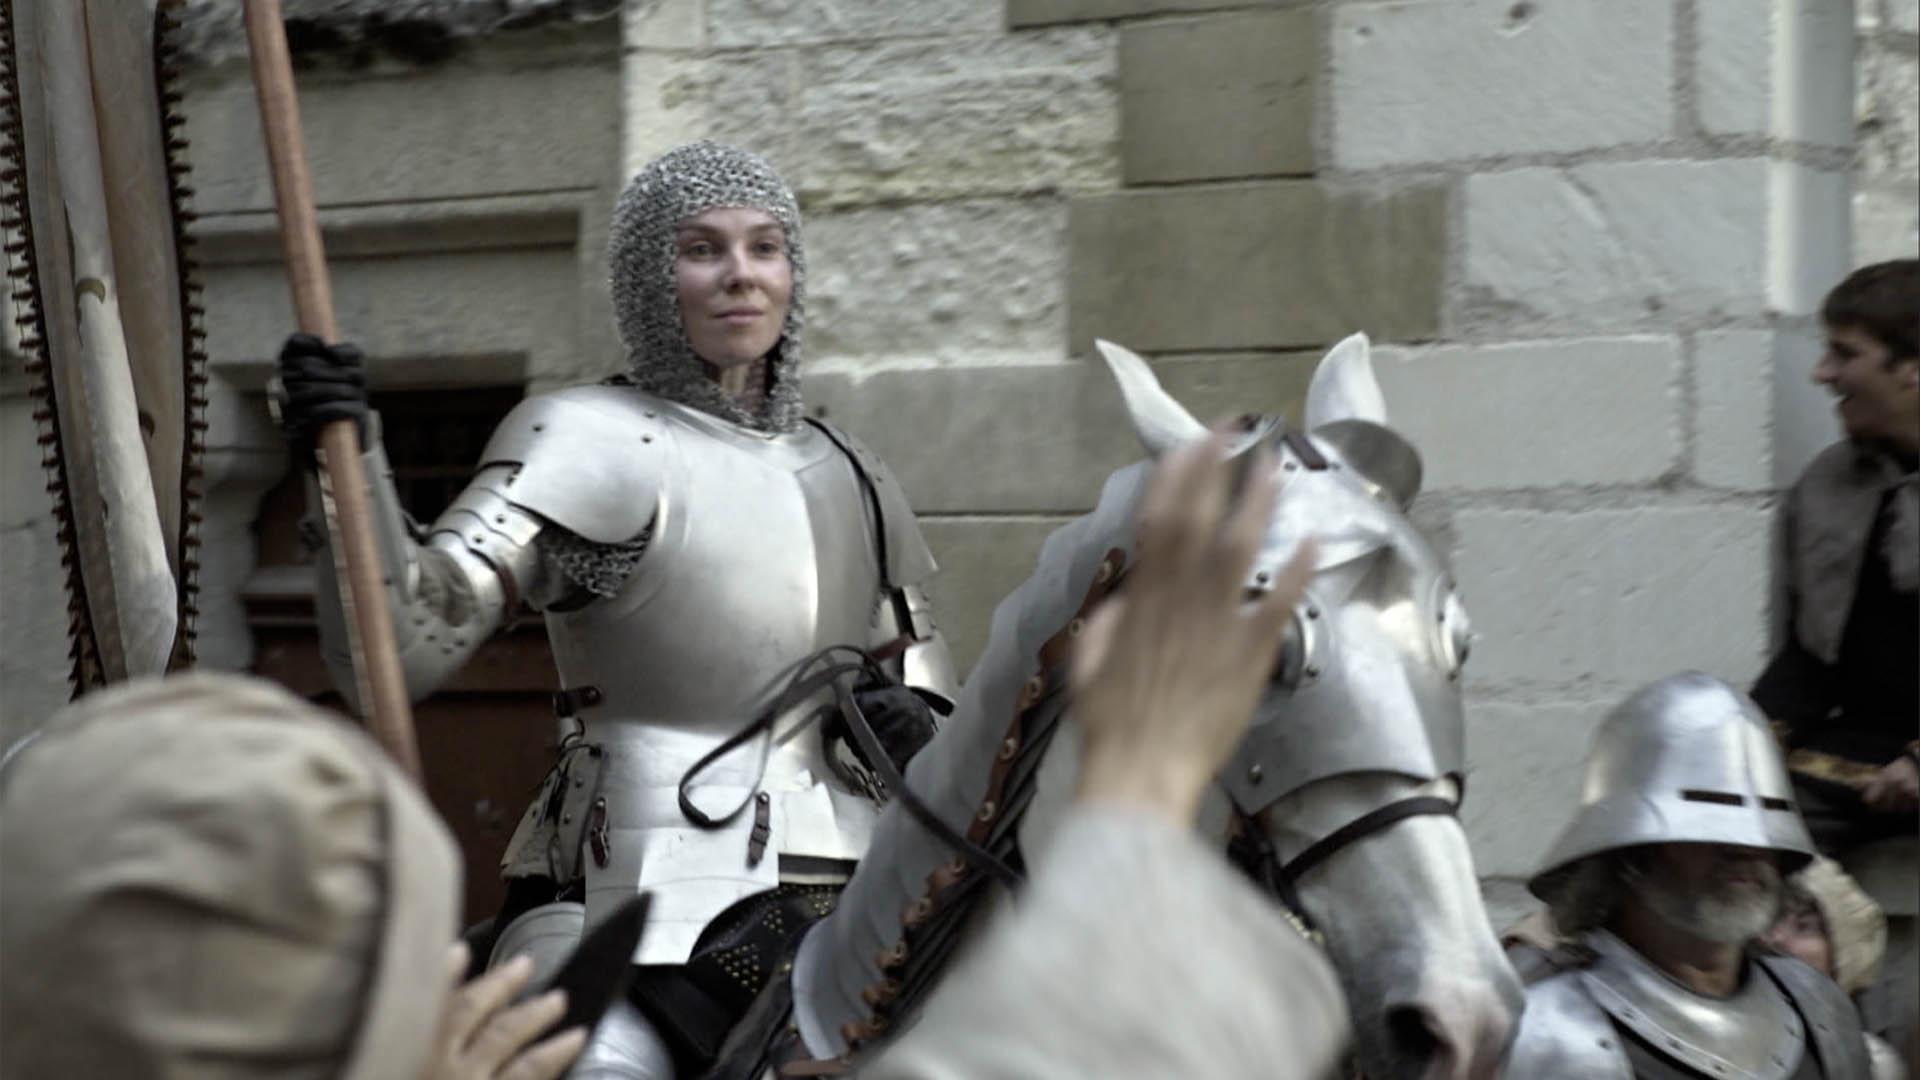 Joan of Arc: A BYUtv Original Production